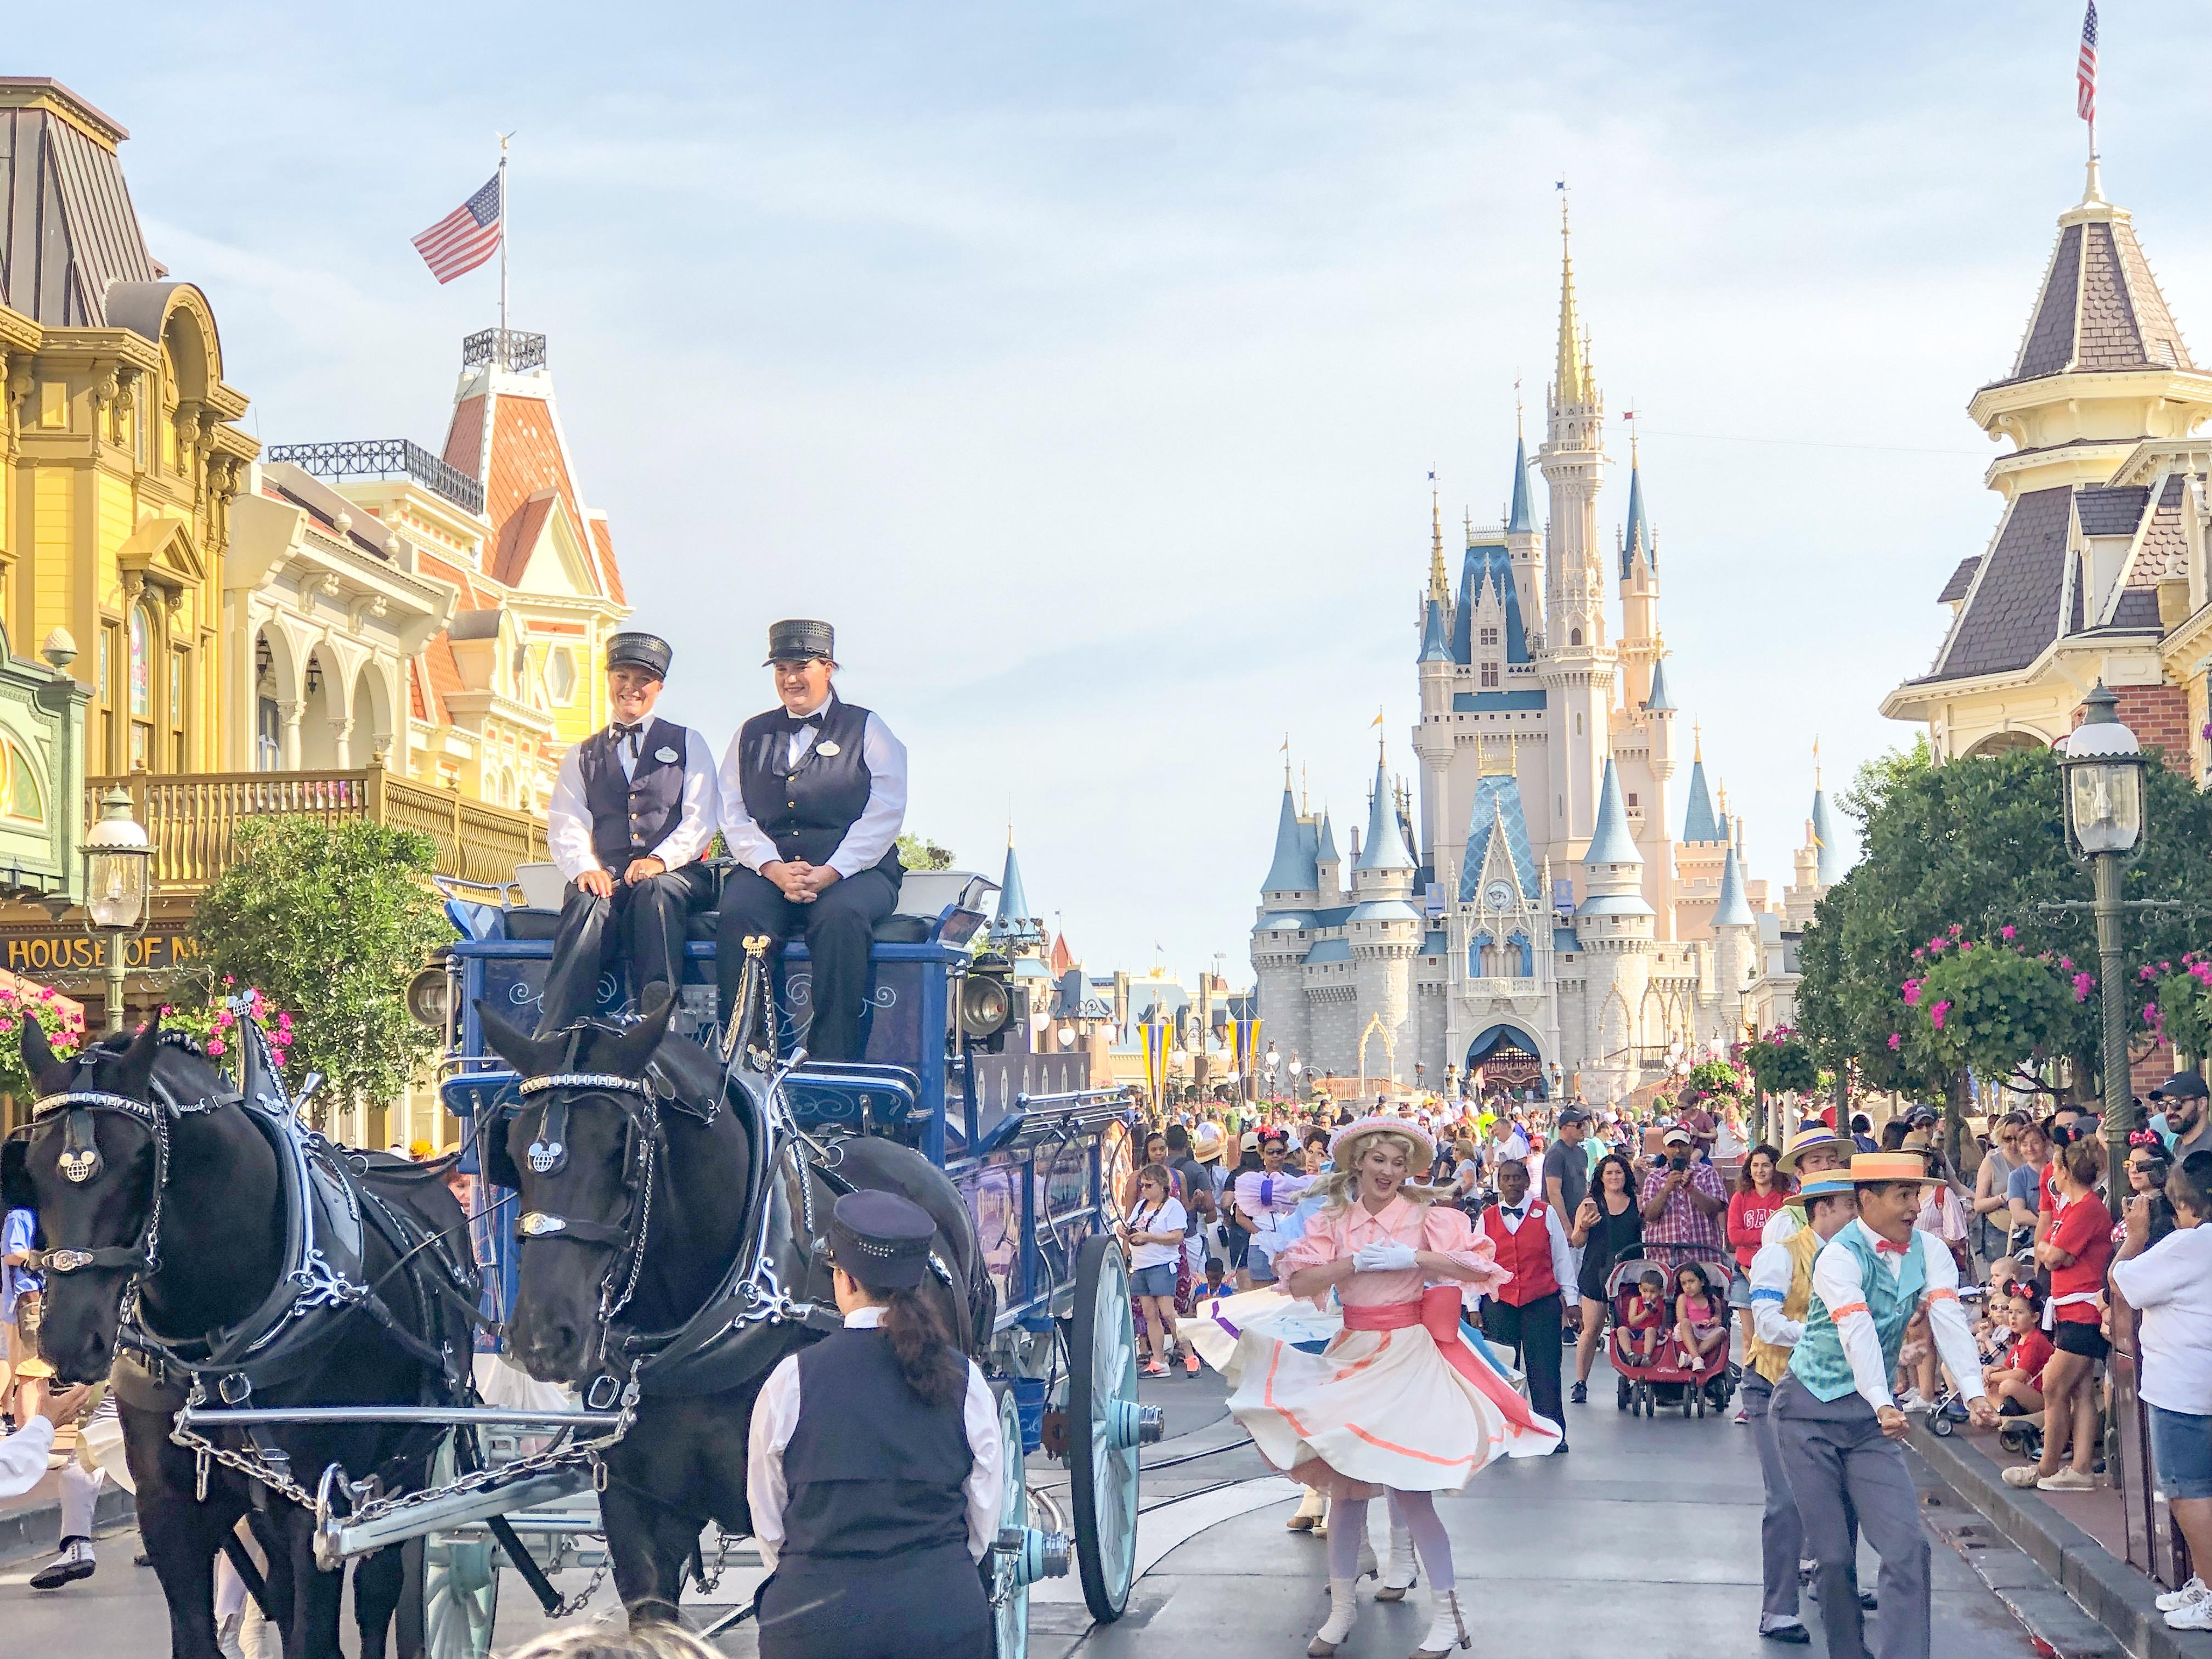 Magic kingdom photo report Main Street